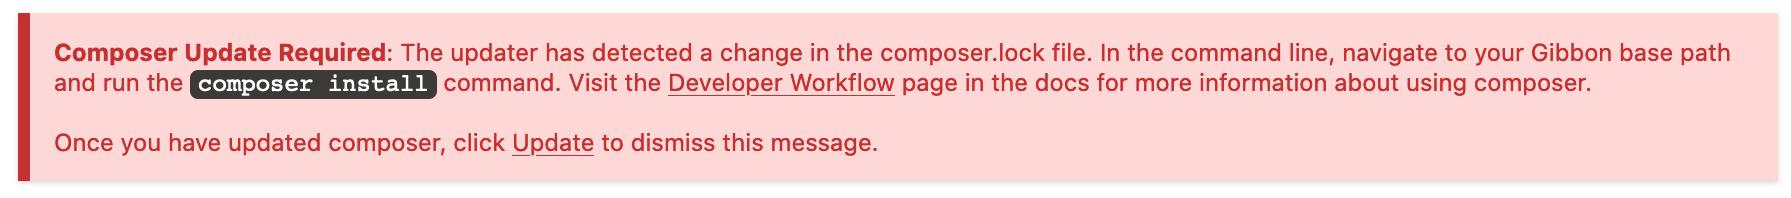 Composer Update